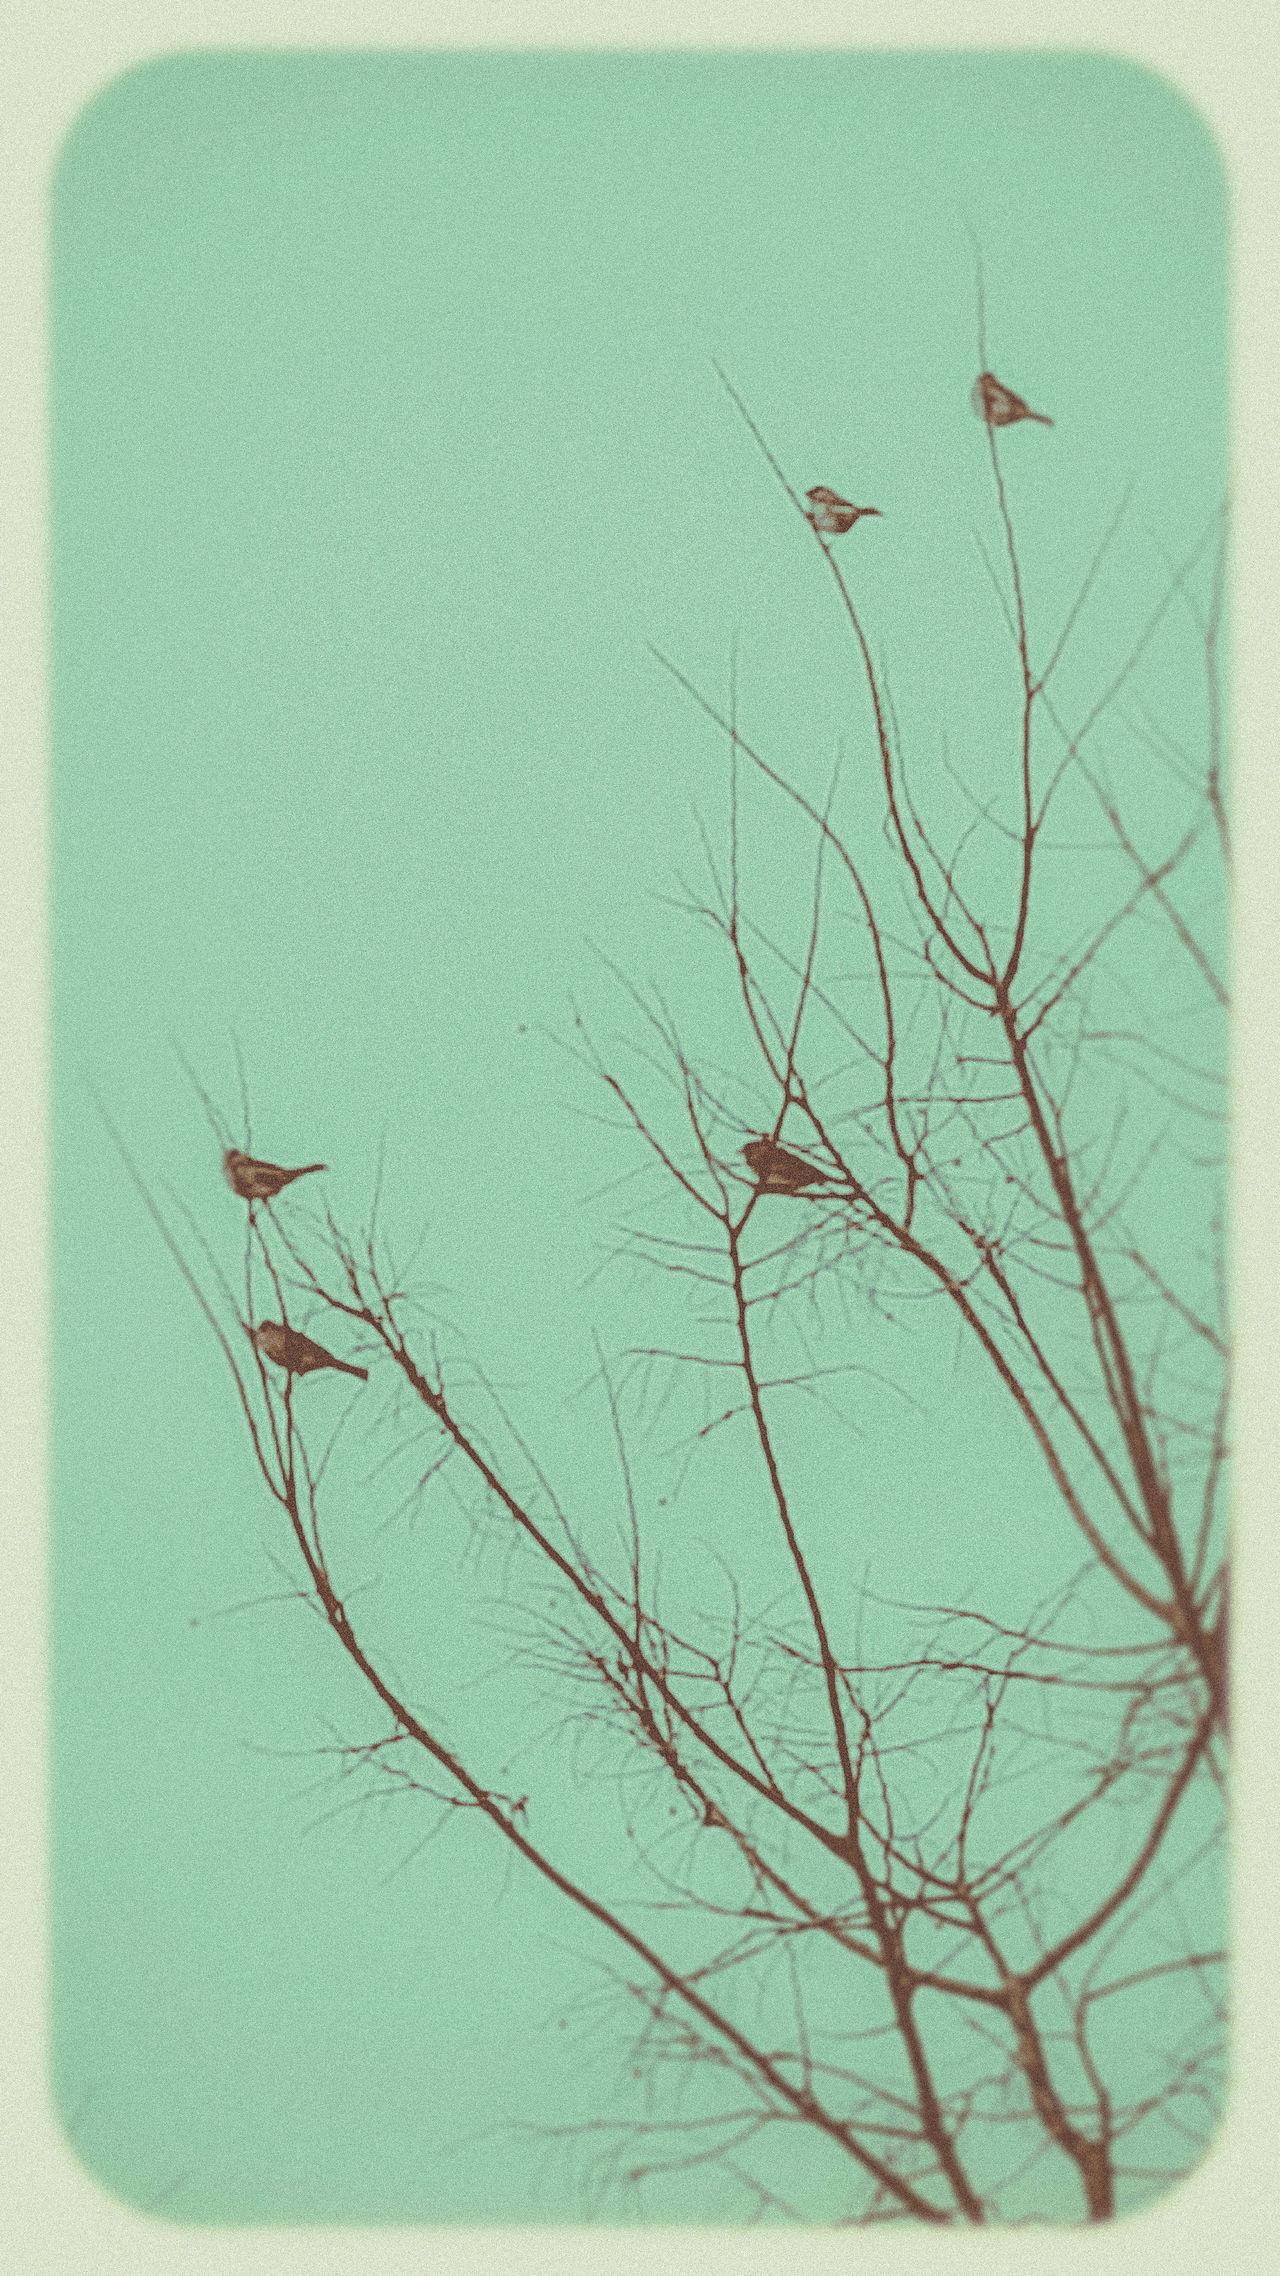 Artistic Bird Silhouette Bird Silhouettes Birds Birds & Trees Birds And Sky  Birds And Trees Pastel Pastel Sky Silhouettes Stylized Tree Branches Vintage Showcase: February